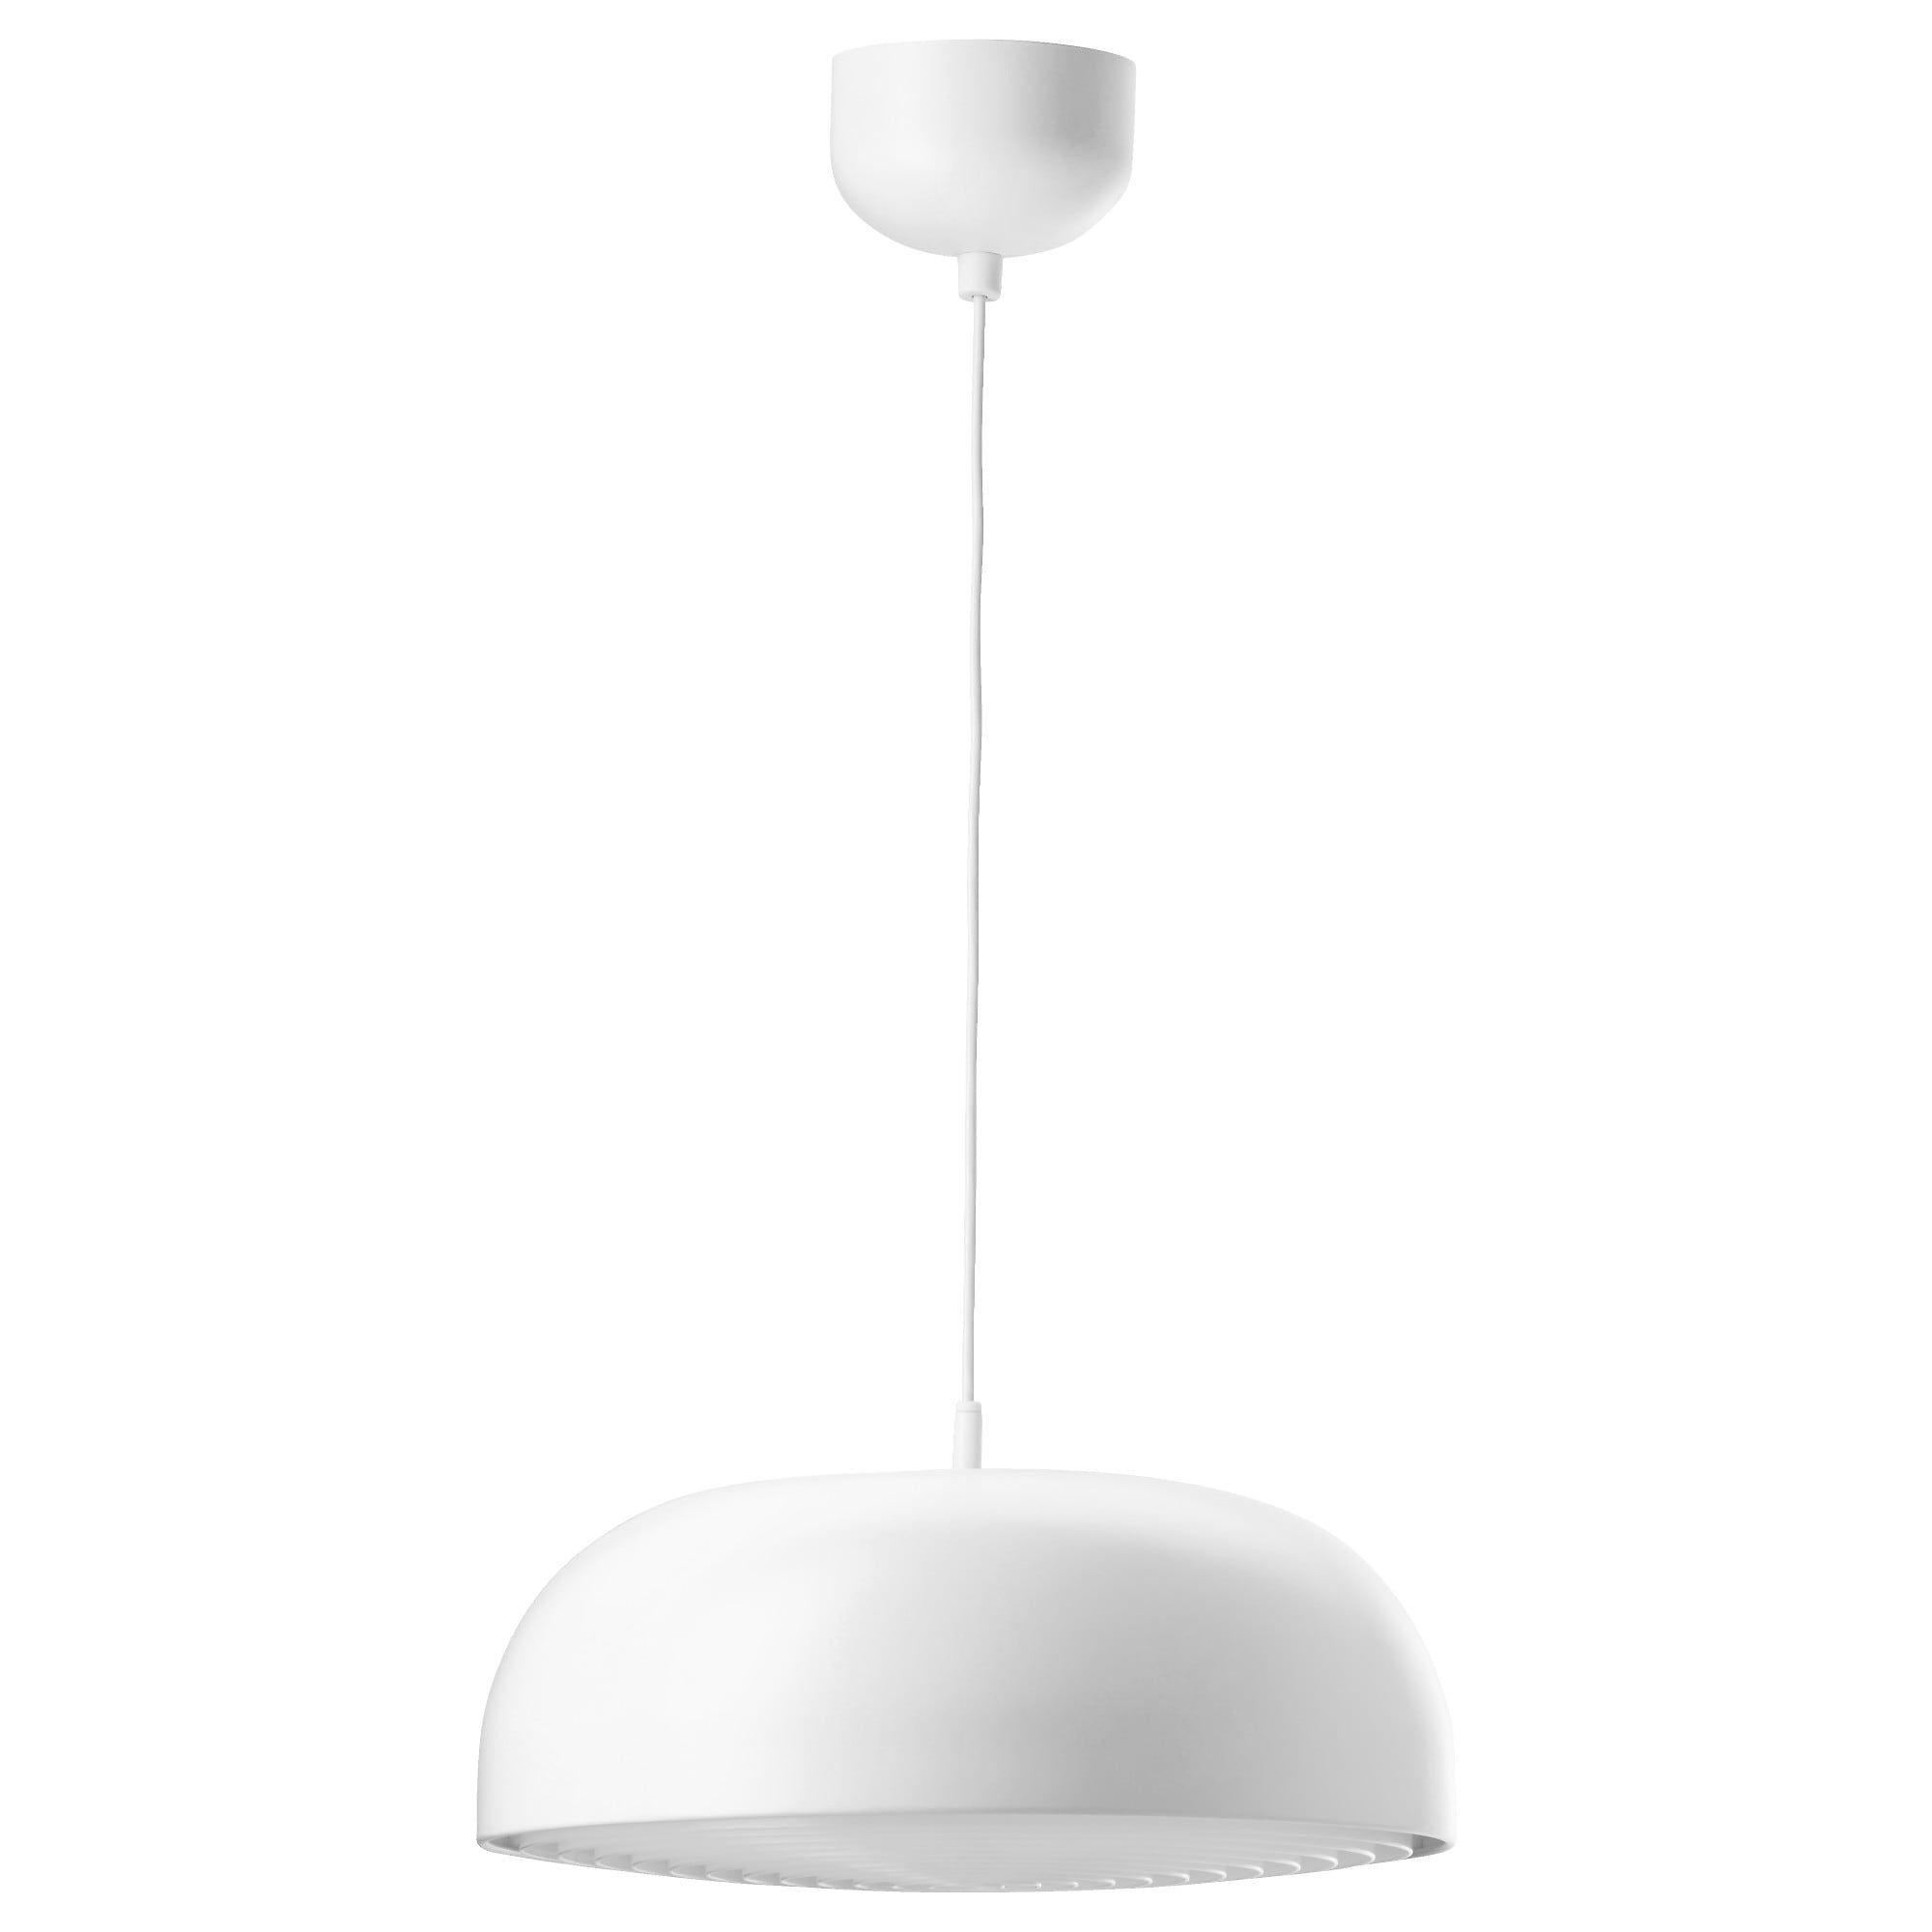 Ikea Nymane Pendant Lamp Pendant Lamp Ikea Ceiling Light